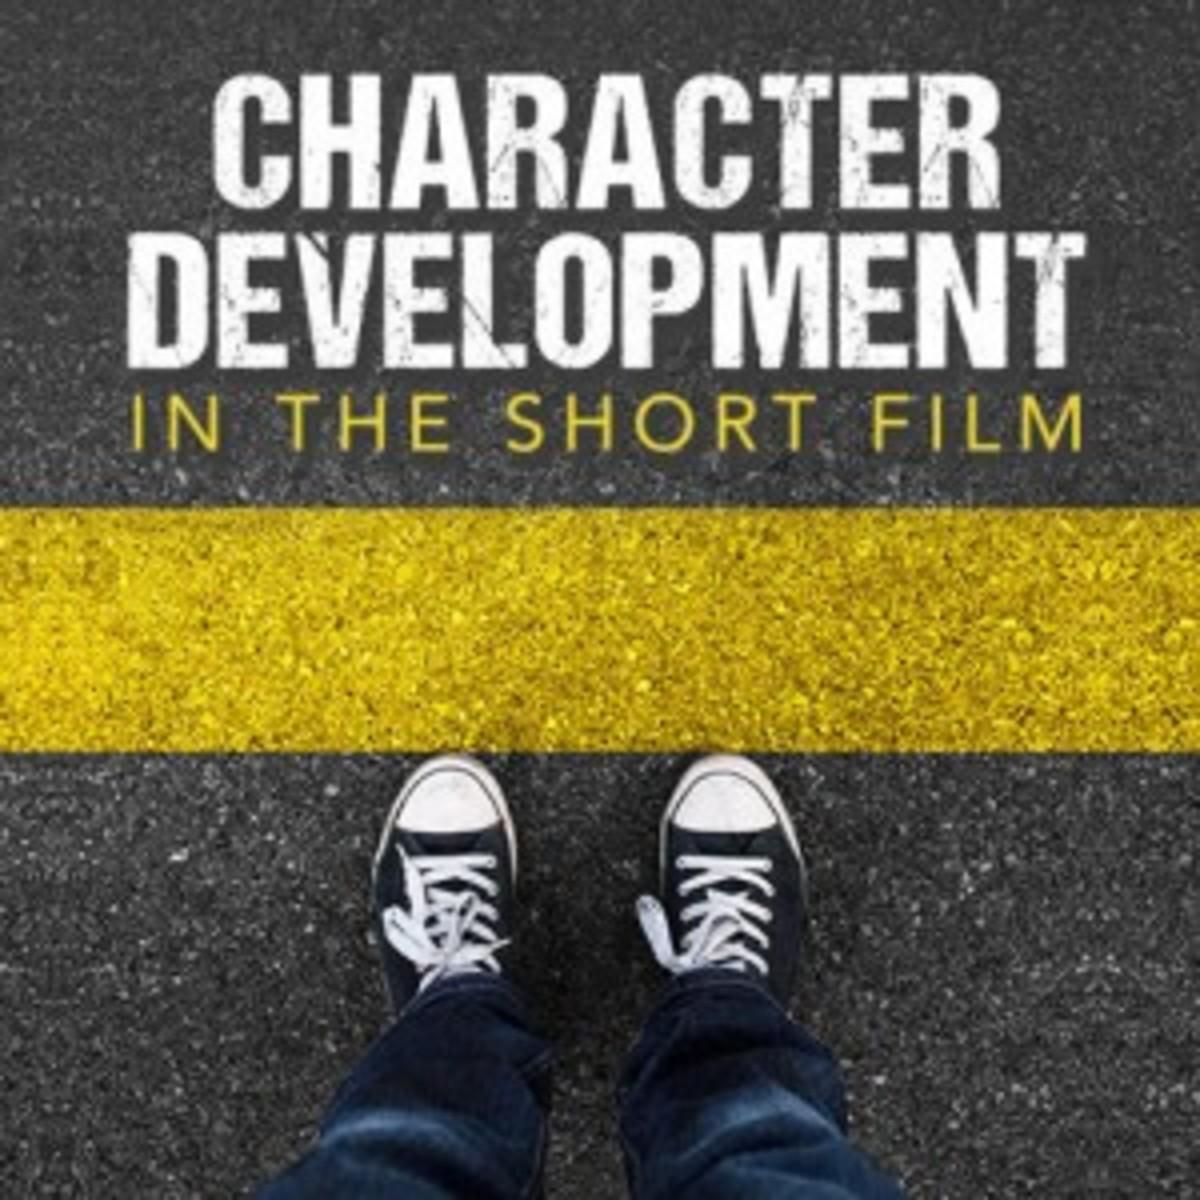 ws-characterdevelopshortfilm-500_medium